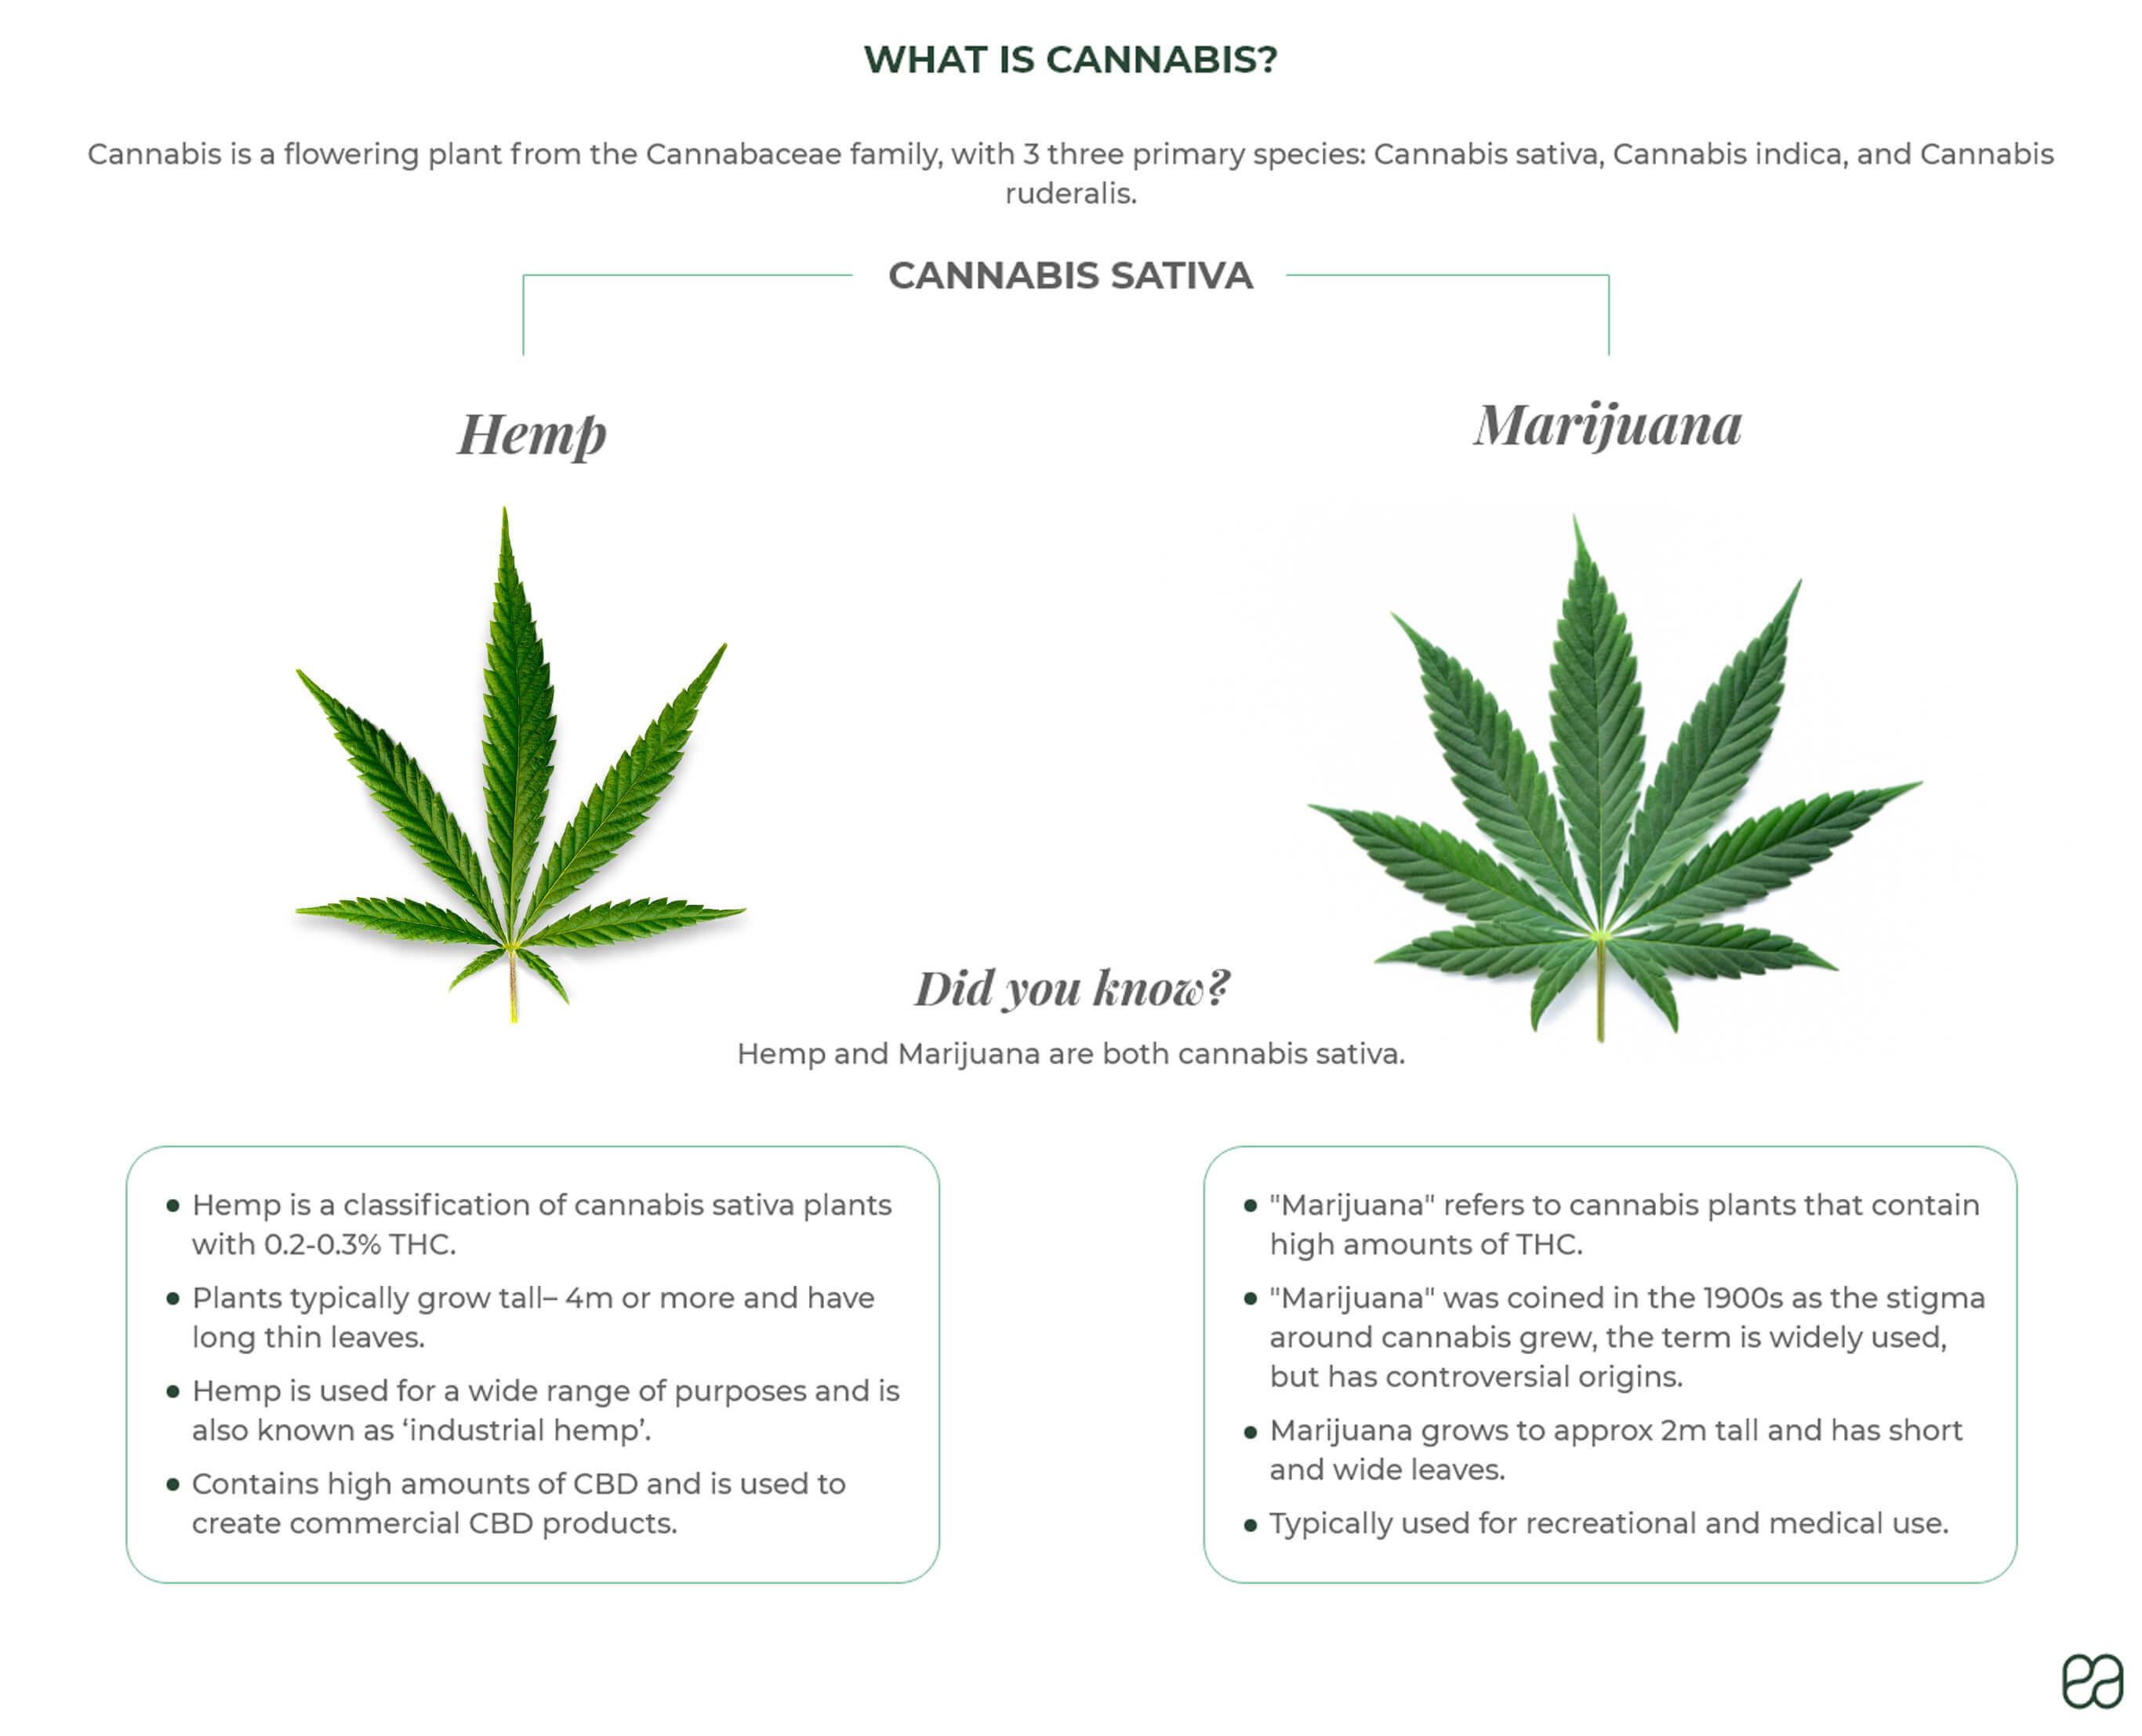 What is cannabis? Hemp and marijuana are both cannabis sativa. Hemp has 0.2% THC. Marijuana has up to 30% THC.